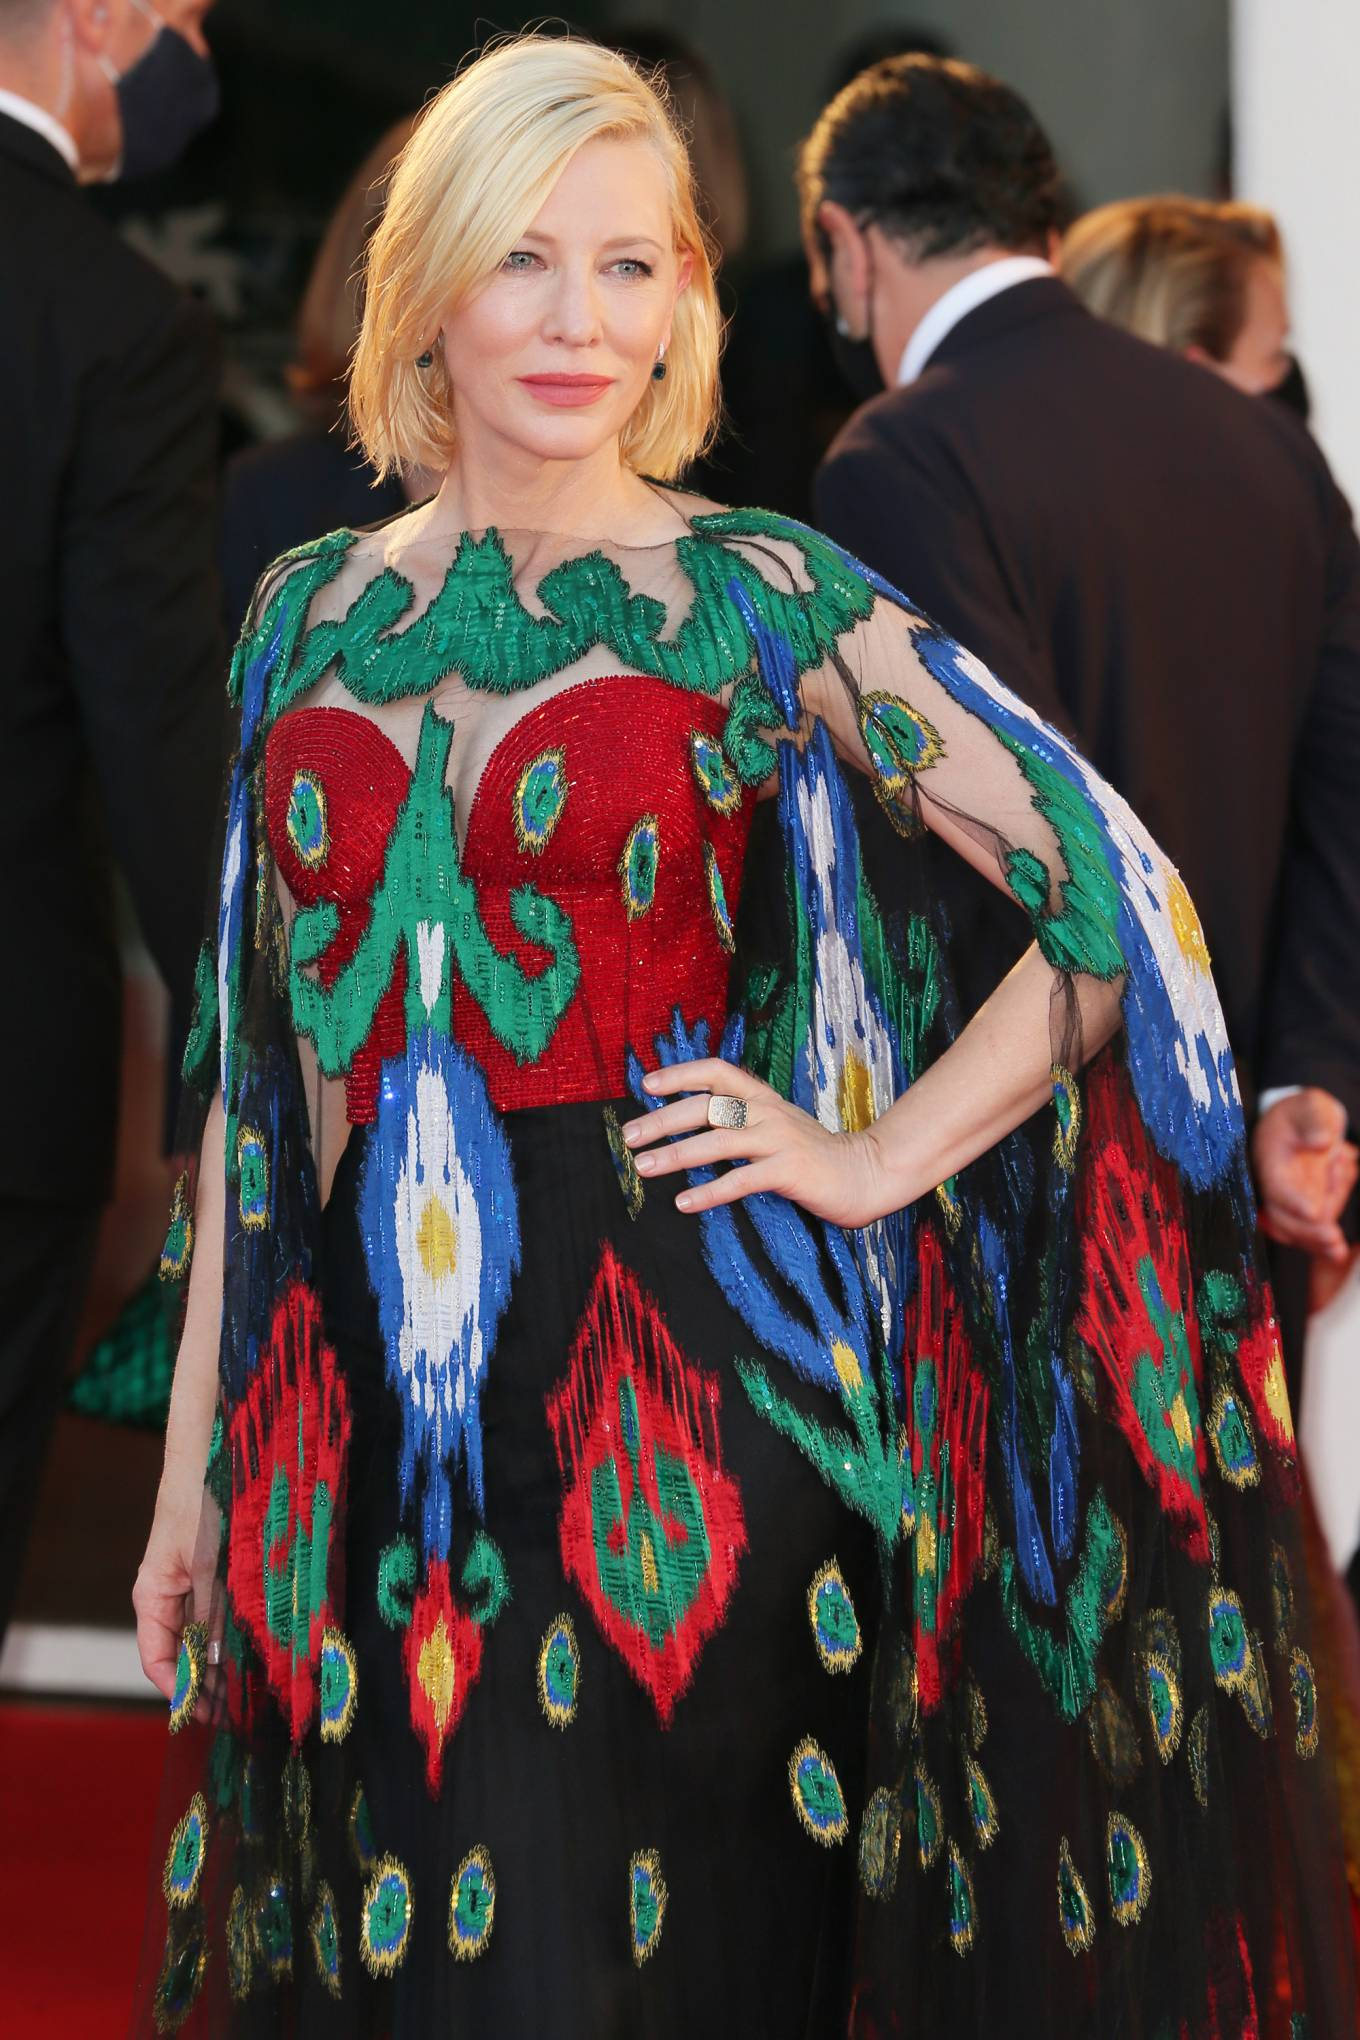 Cate Blanchett 2020 : Cate Blanchett – Closing Ceremony Red Carpet of 2020 Venice Film Festival in Venice-01